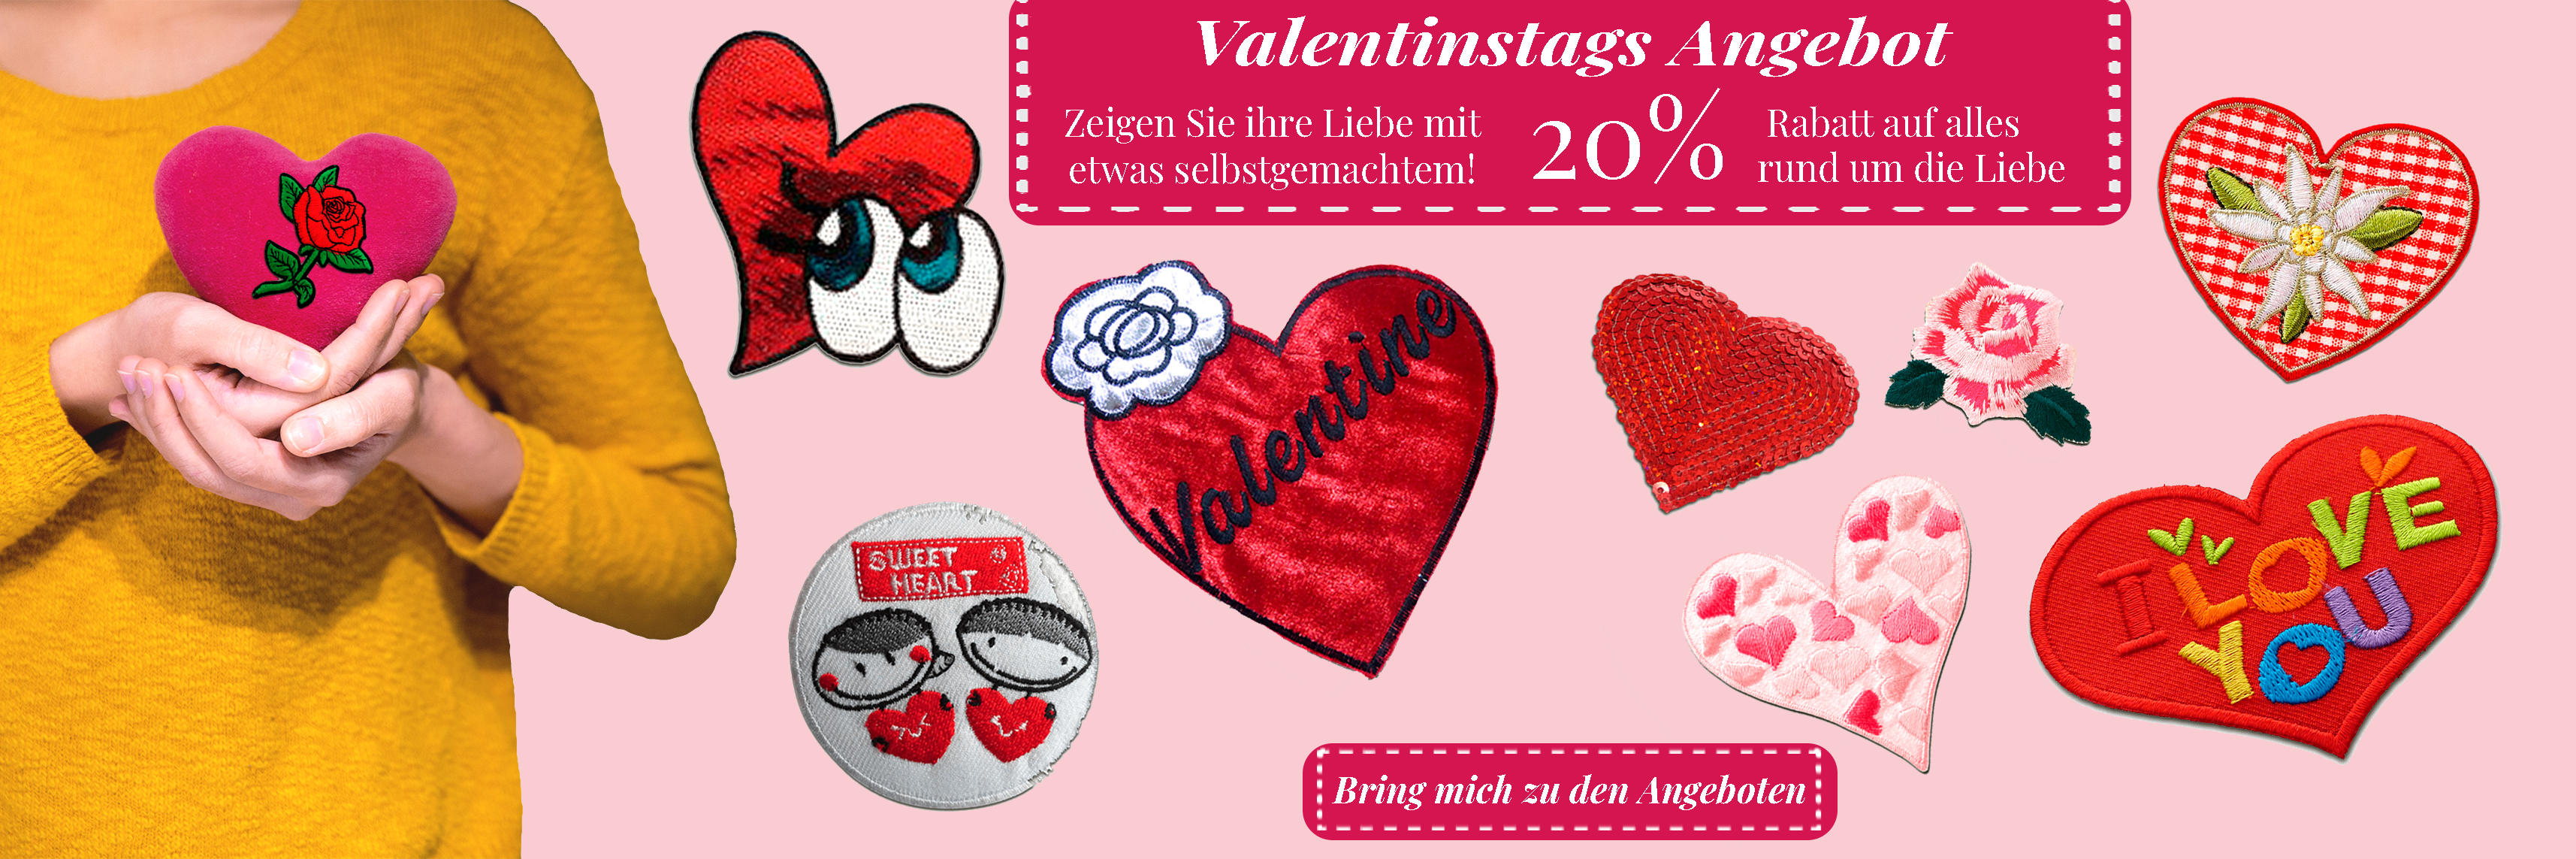 Valentinstags-Special